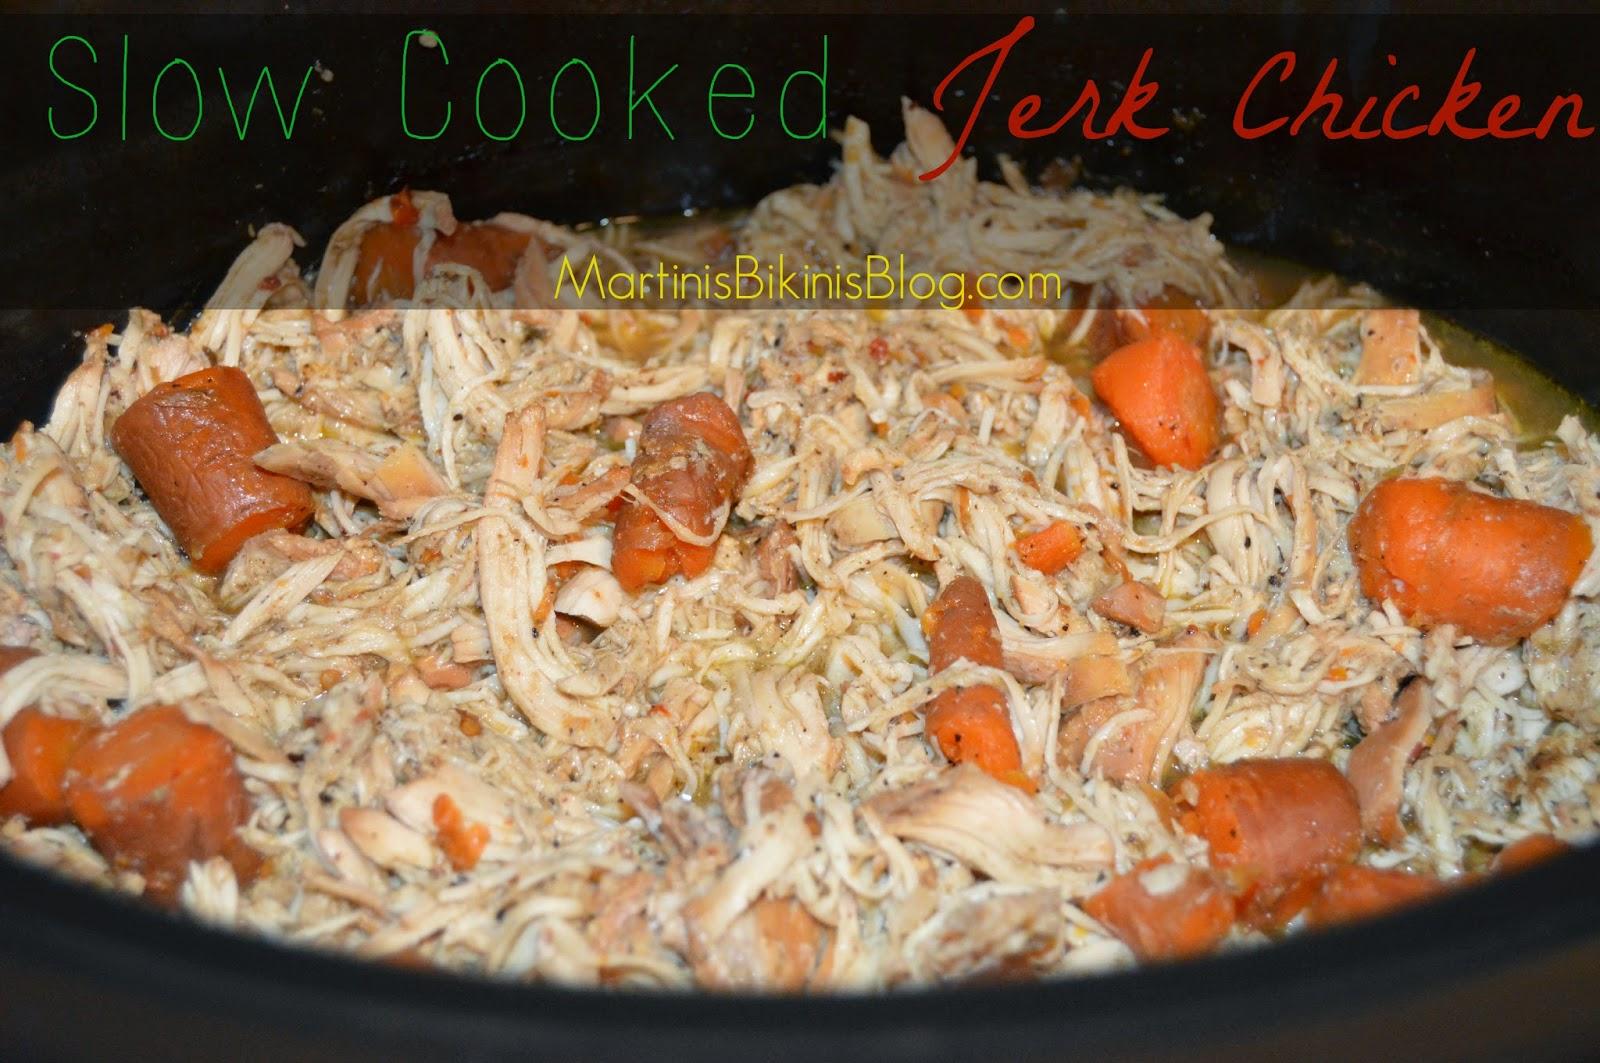 Walkerswood jerk pork recipes